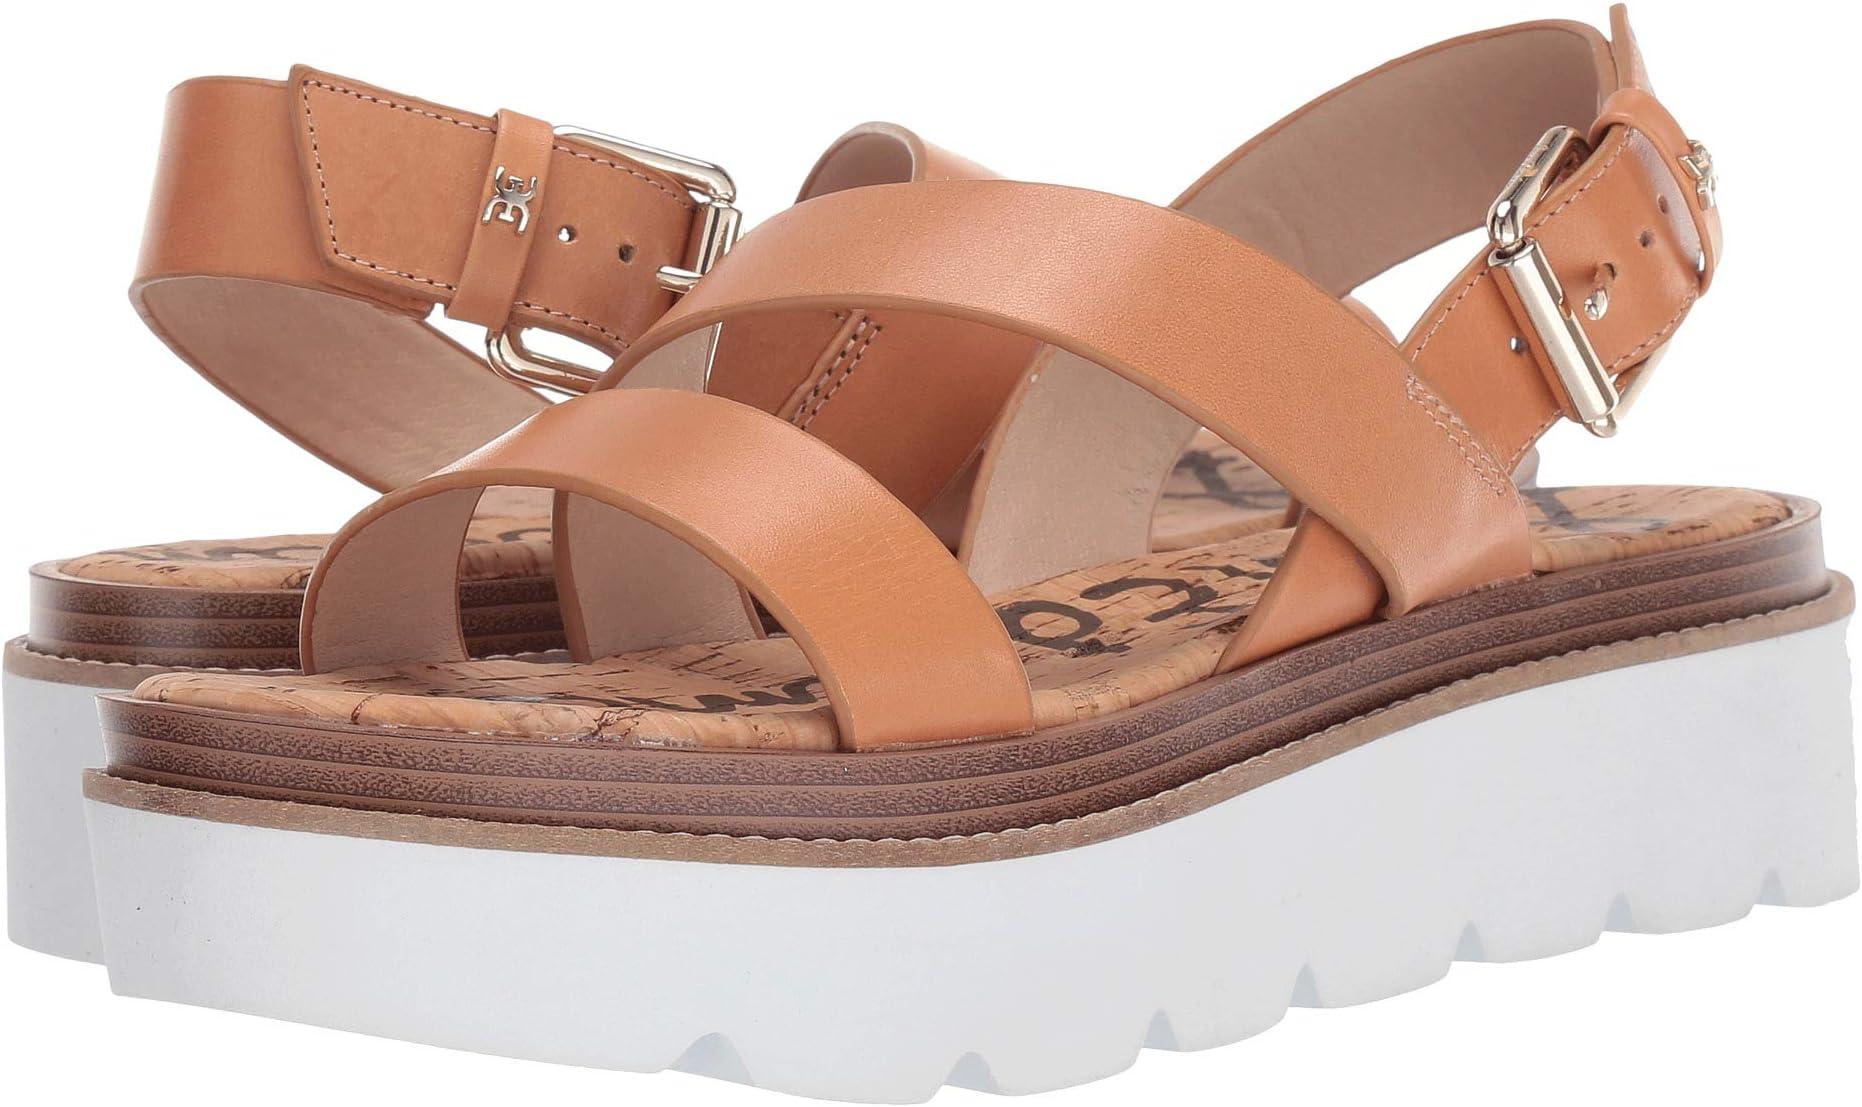 20696913d Sam Edelman Boots, Shoes, Clothing | Zappos.com